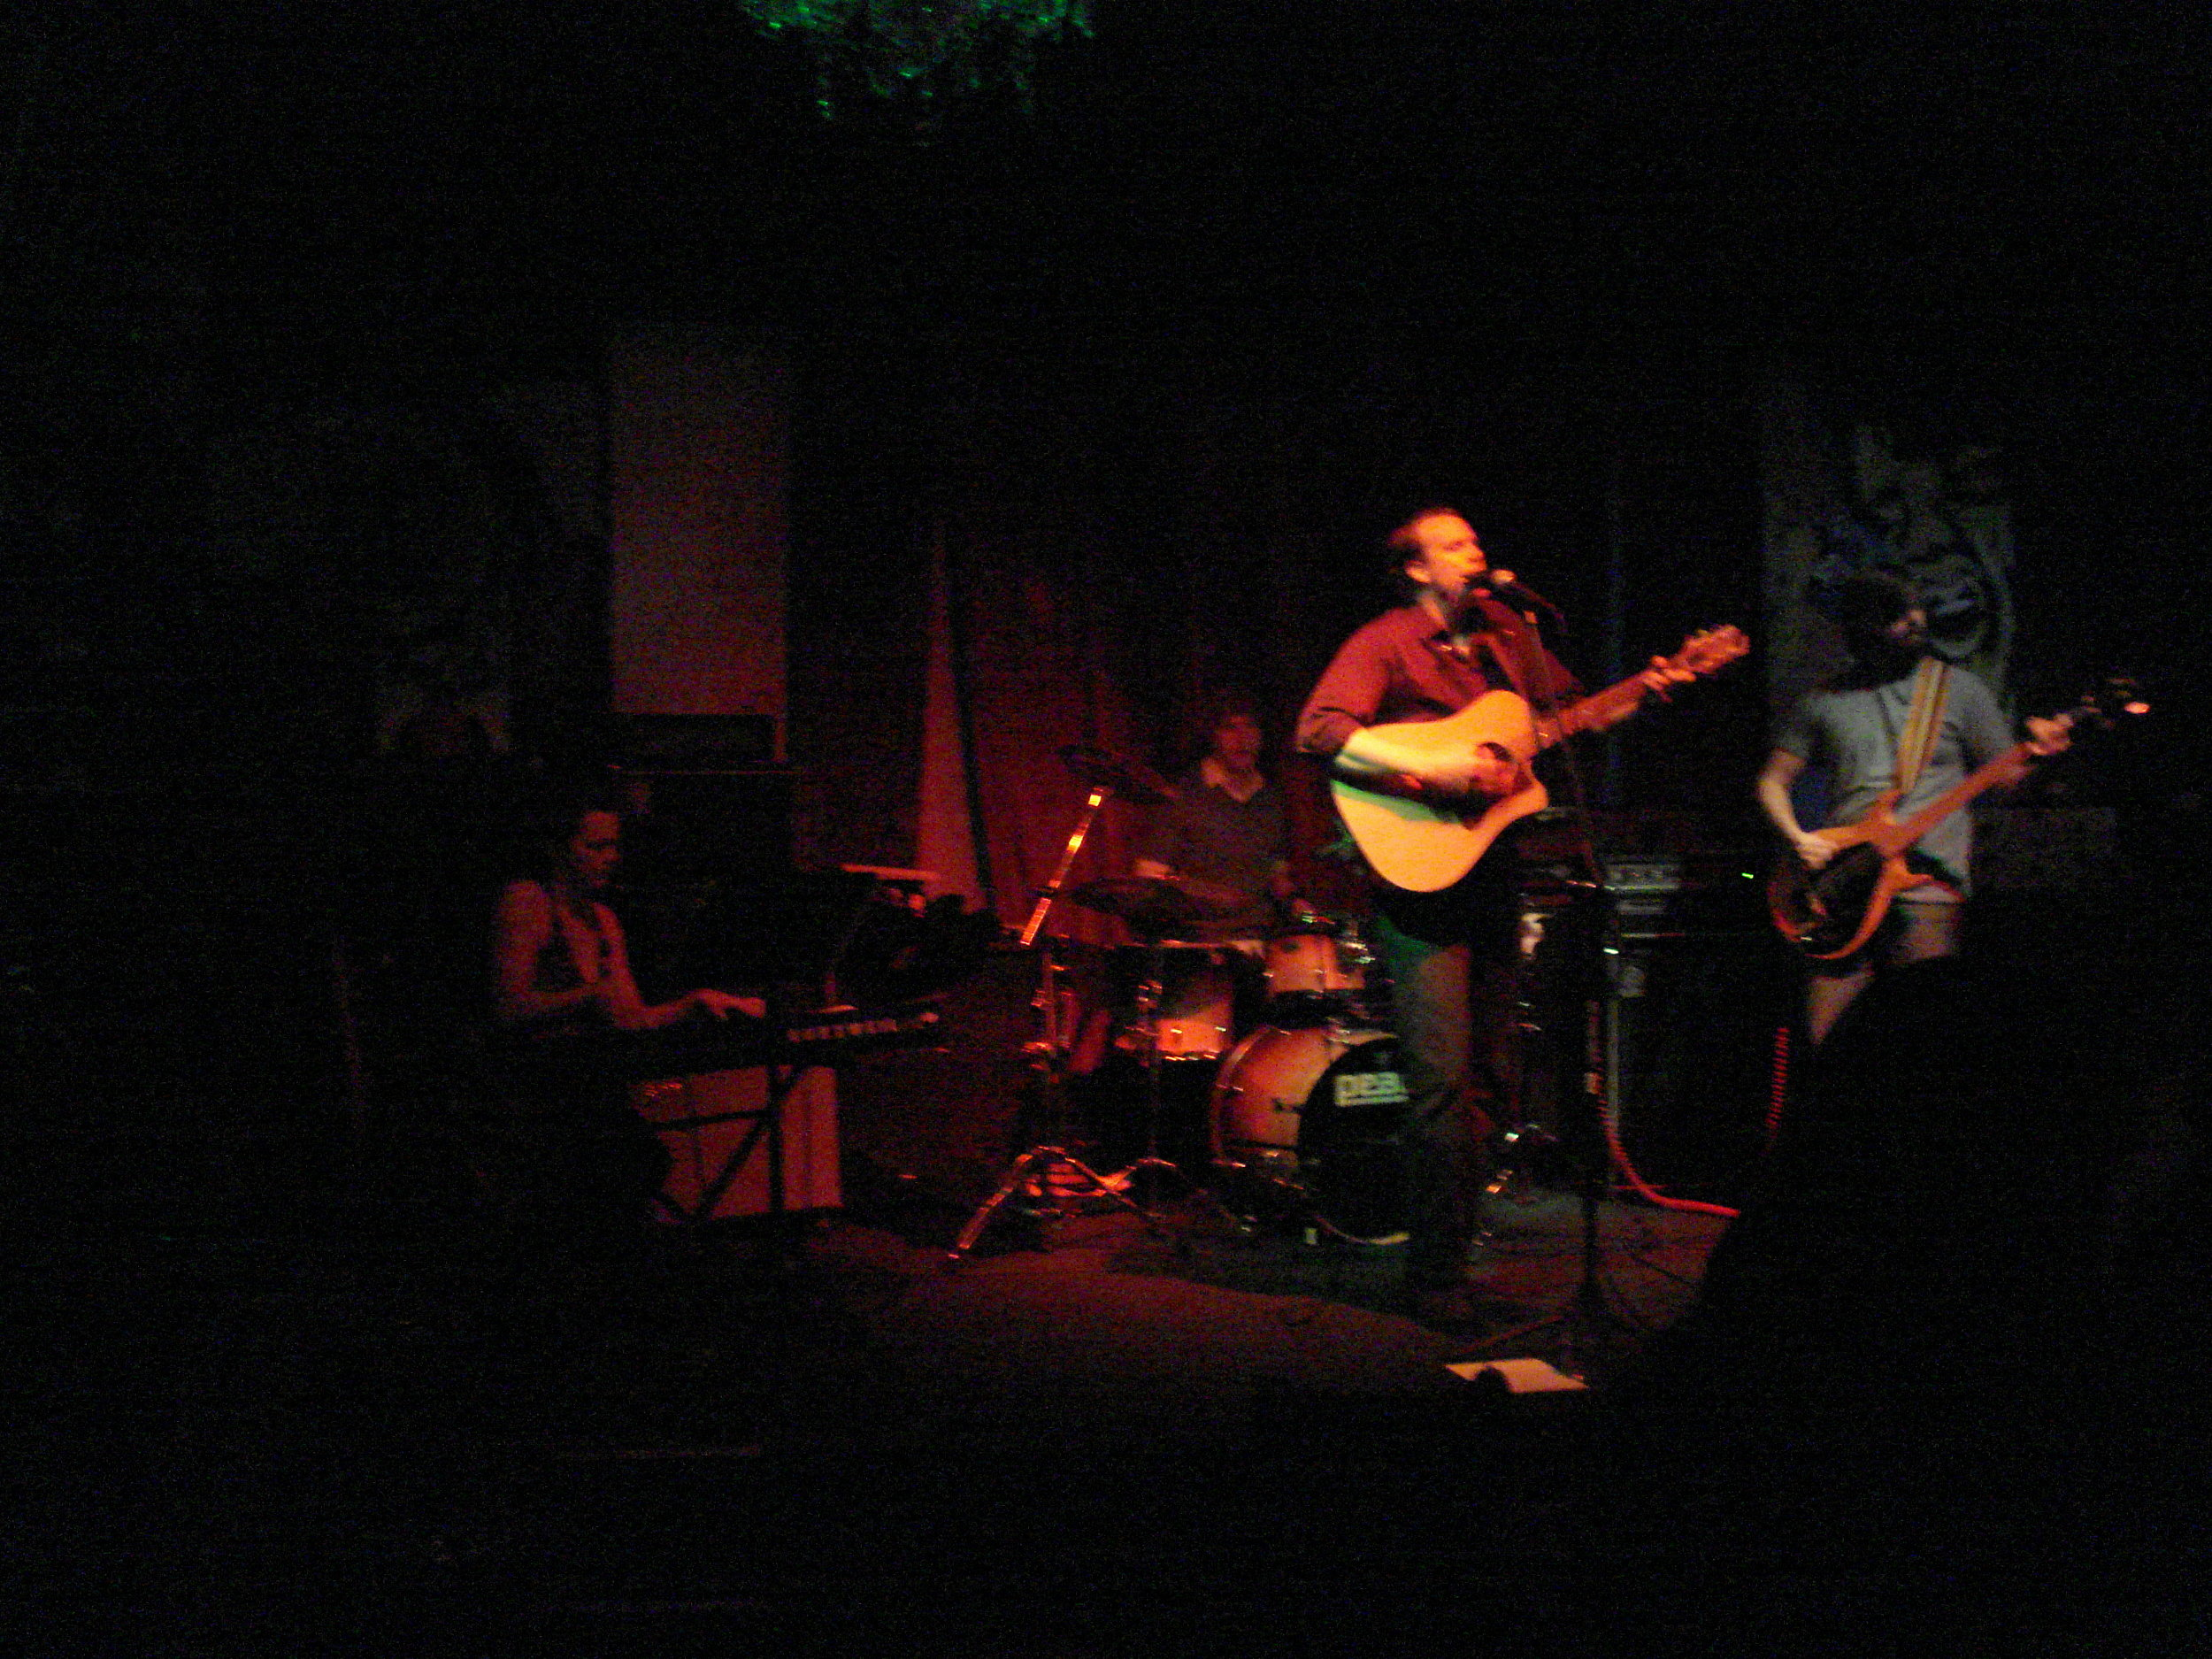 Silvergirl's first show at Mahoney's. w/Allison Hendrix, Matthew Sitz and Adam Melberth